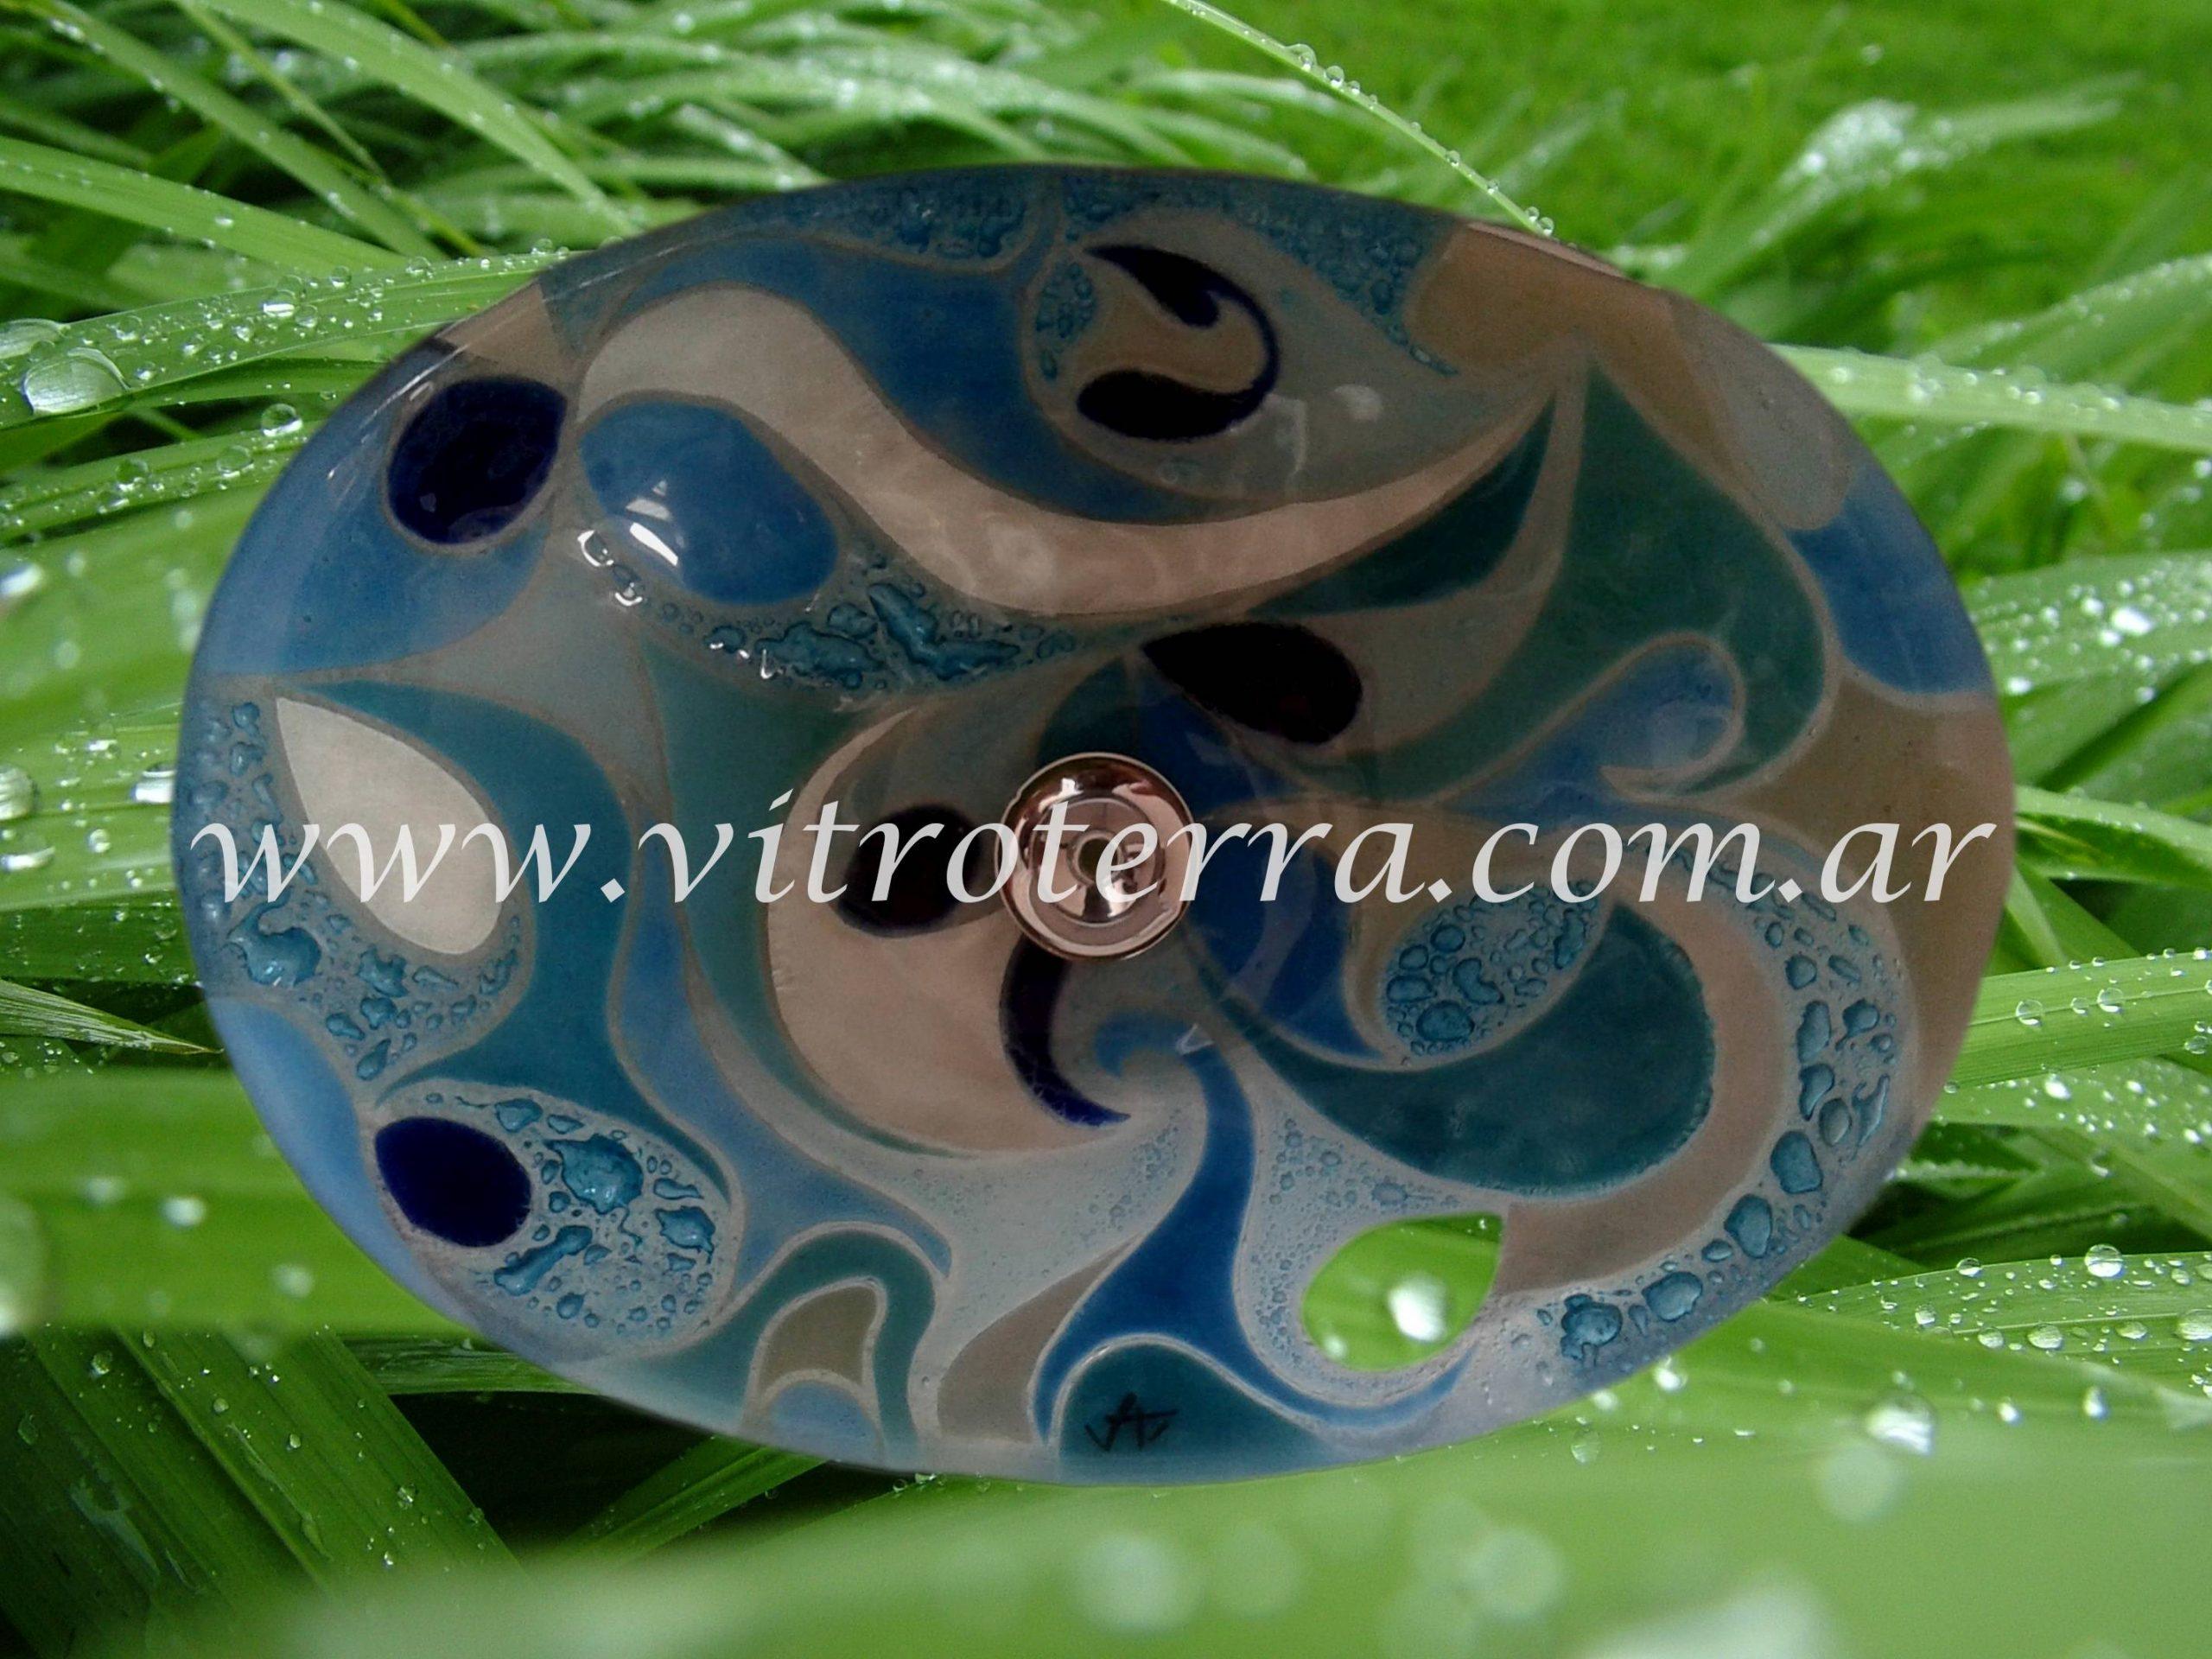 Bacha oval de vidrio Serendipity